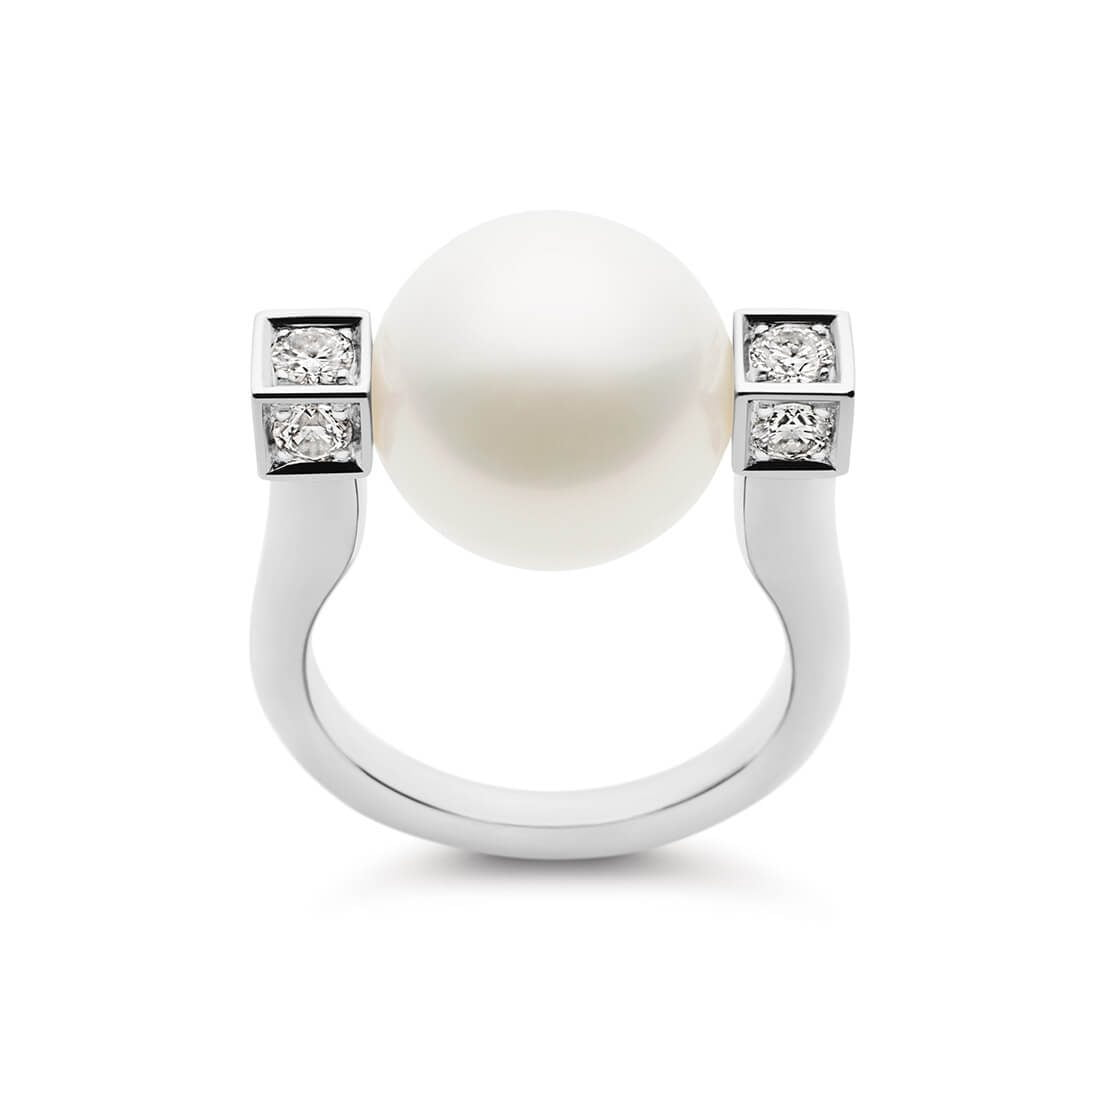 Kailis - Luna Ring, White Gold